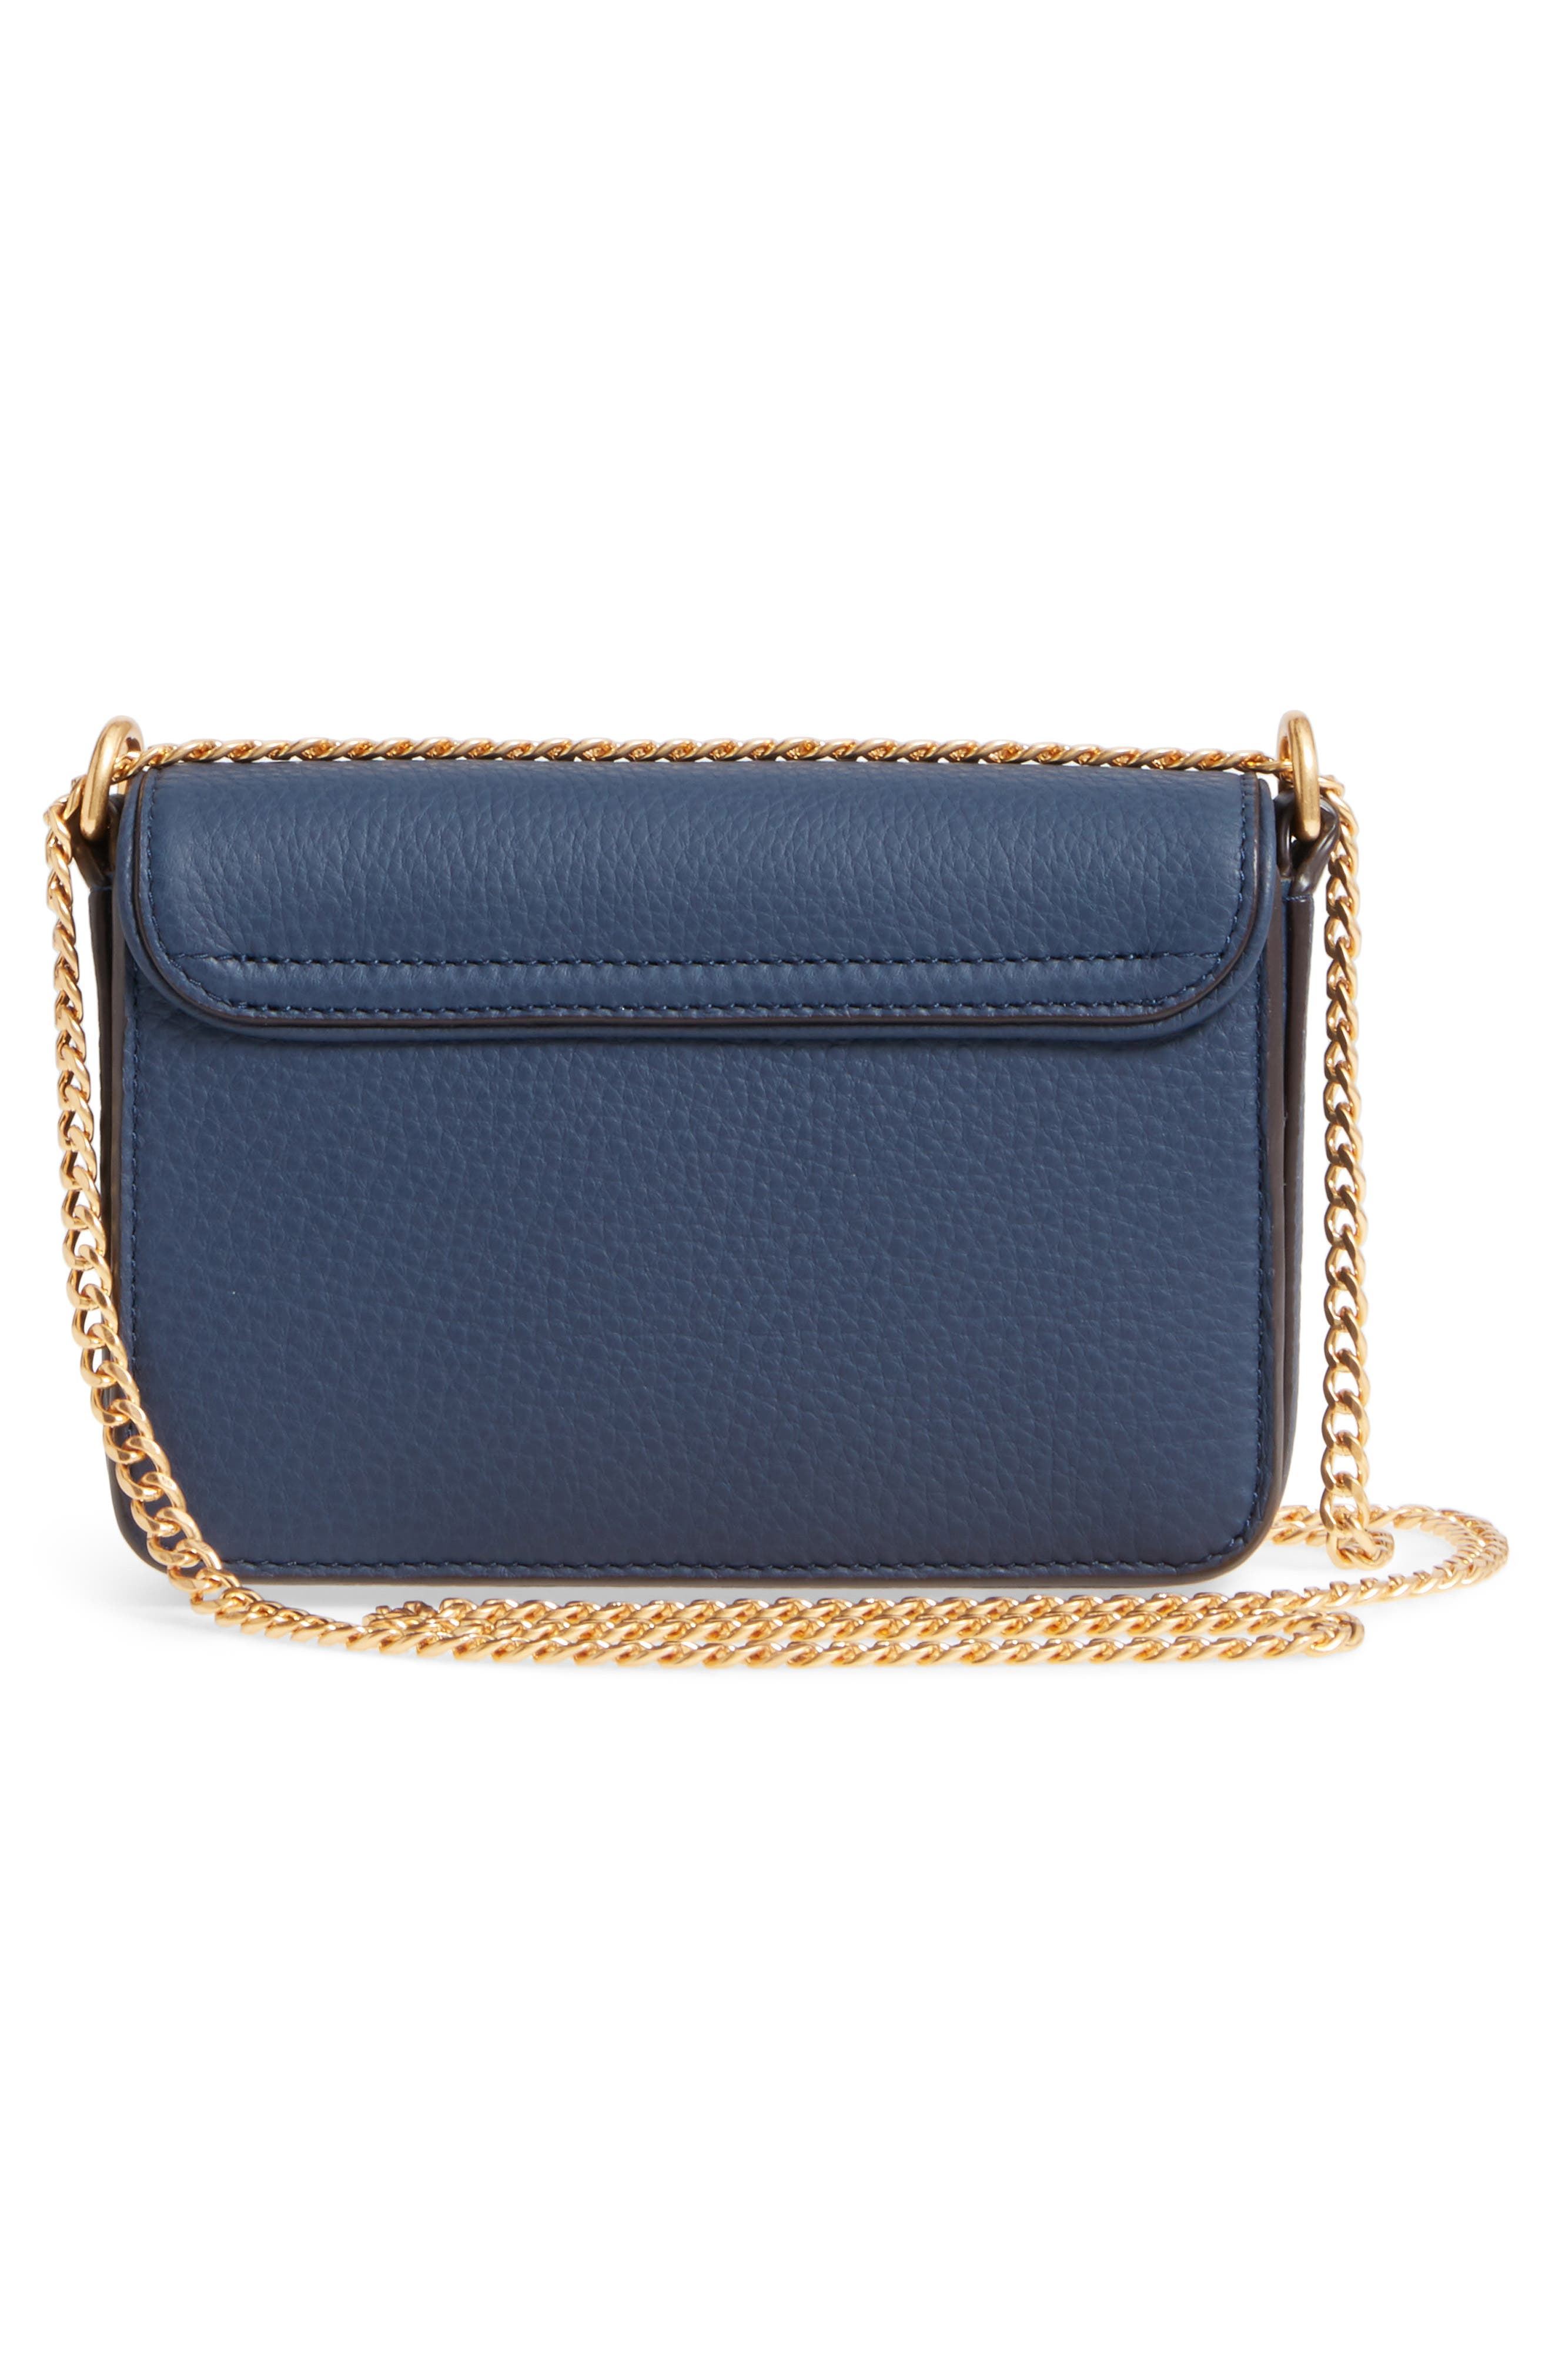 Mini Chelsea Leather Convertible Crossbody Bag,                             Alternate thumbnail 8, color,